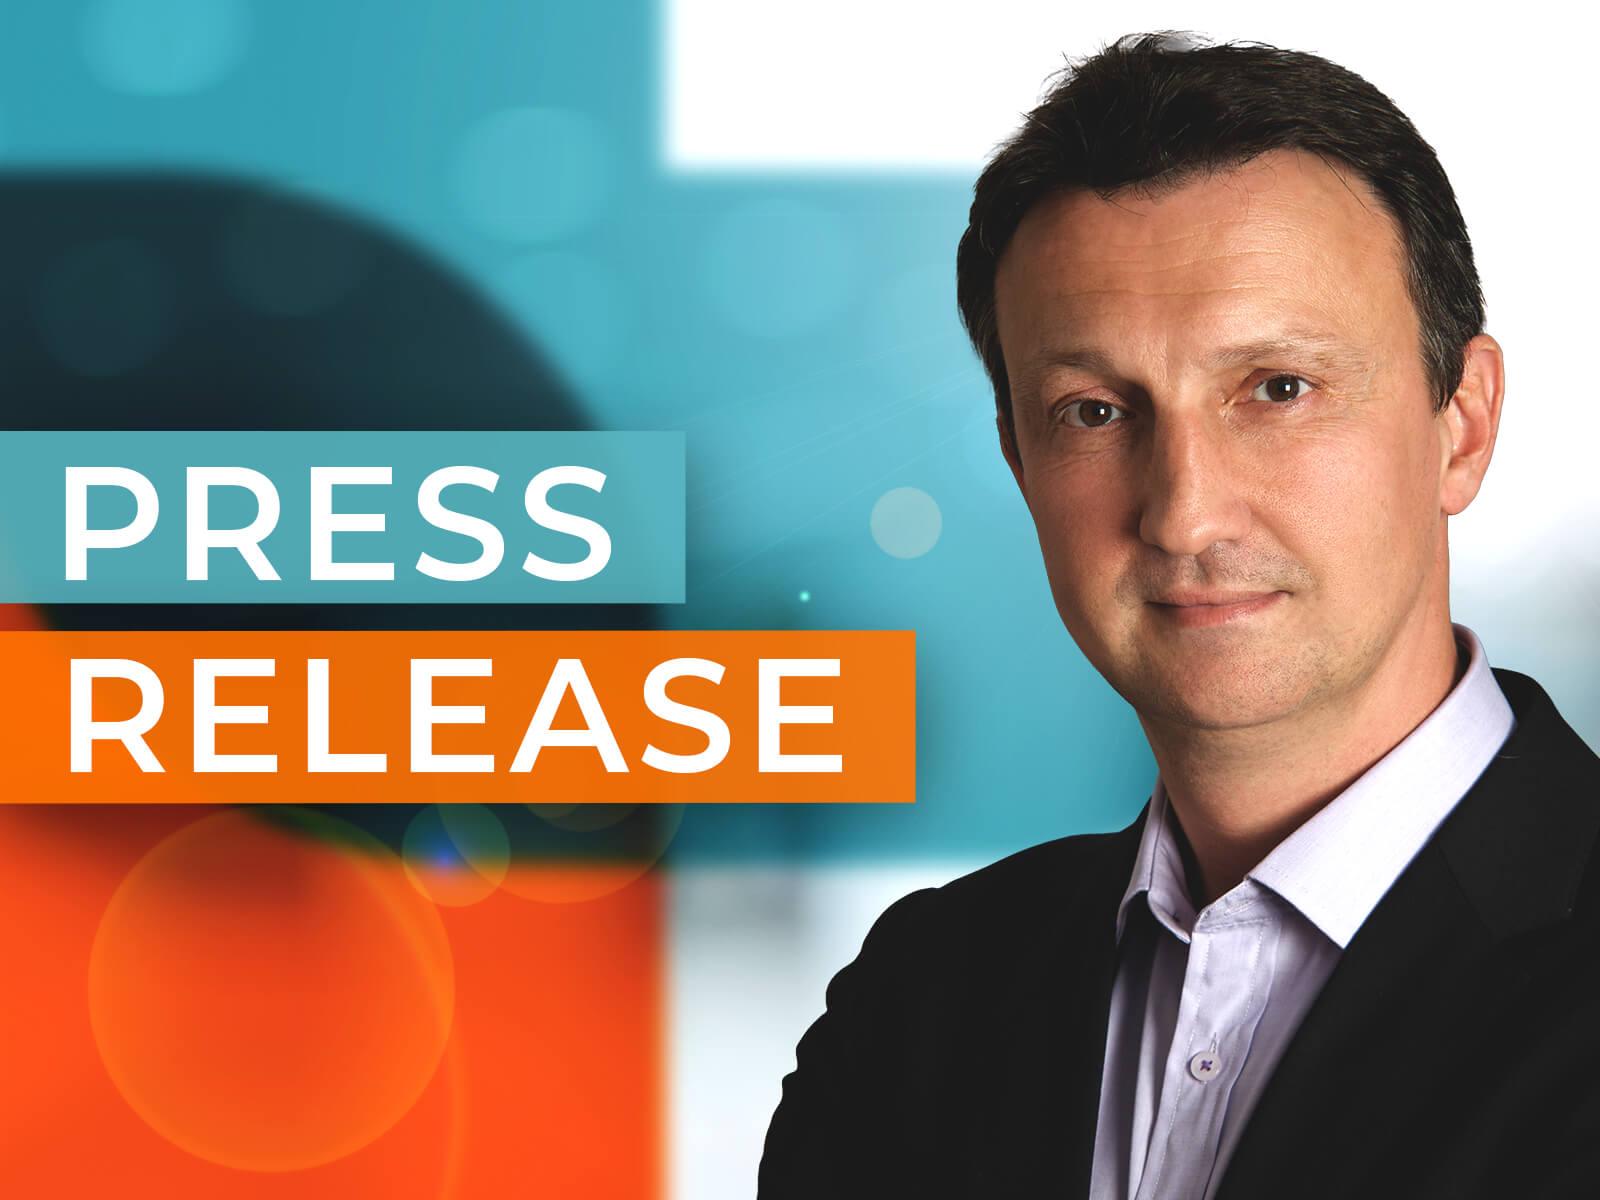 Richard Foster joins InfoSum as Chief Revenue Officer